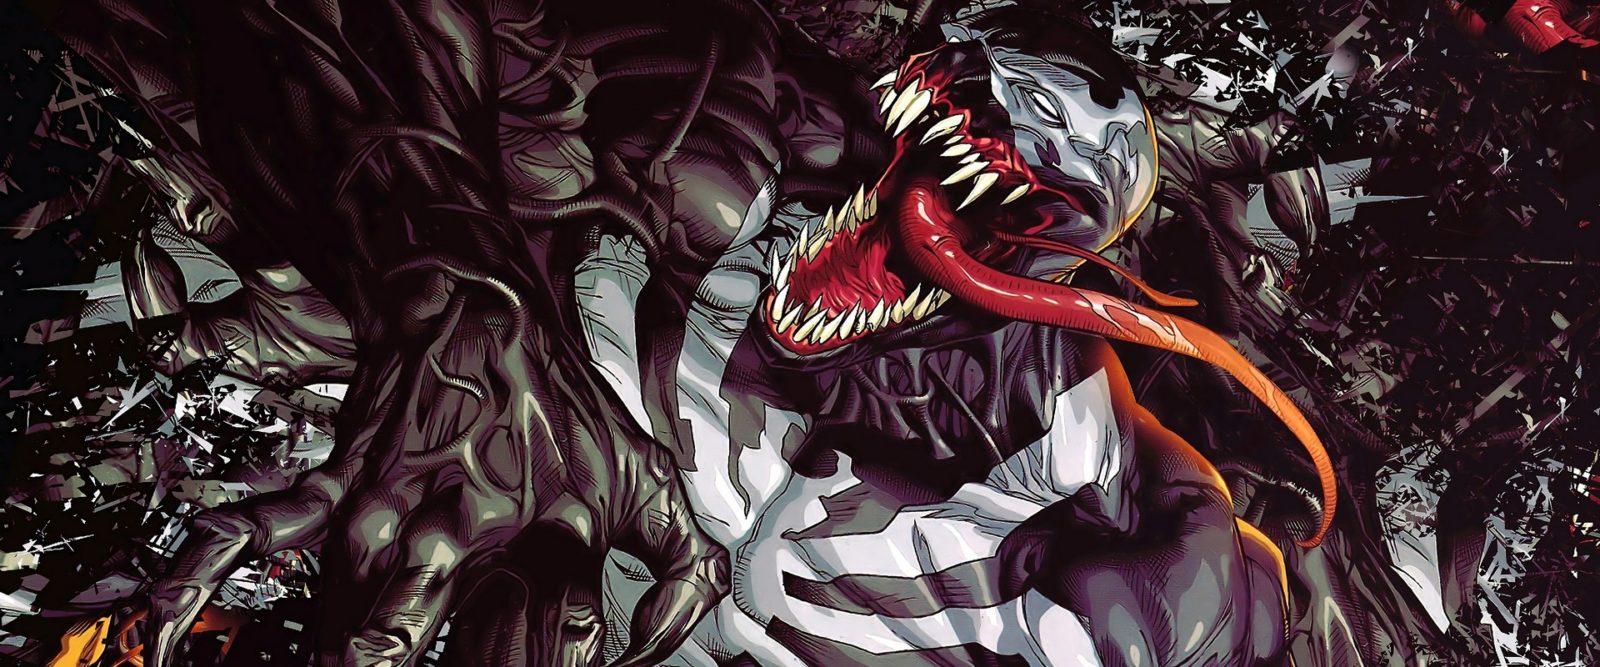 Новая «Матрица» проникла в сиквел «Венома»